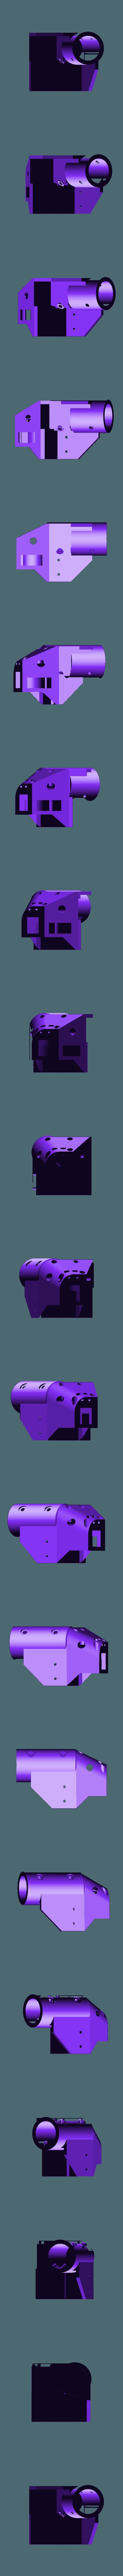 corner_front_right.stl Download free STL file FDM Printer de Kleine Reus 300x300x900 • 3D printable object, Job